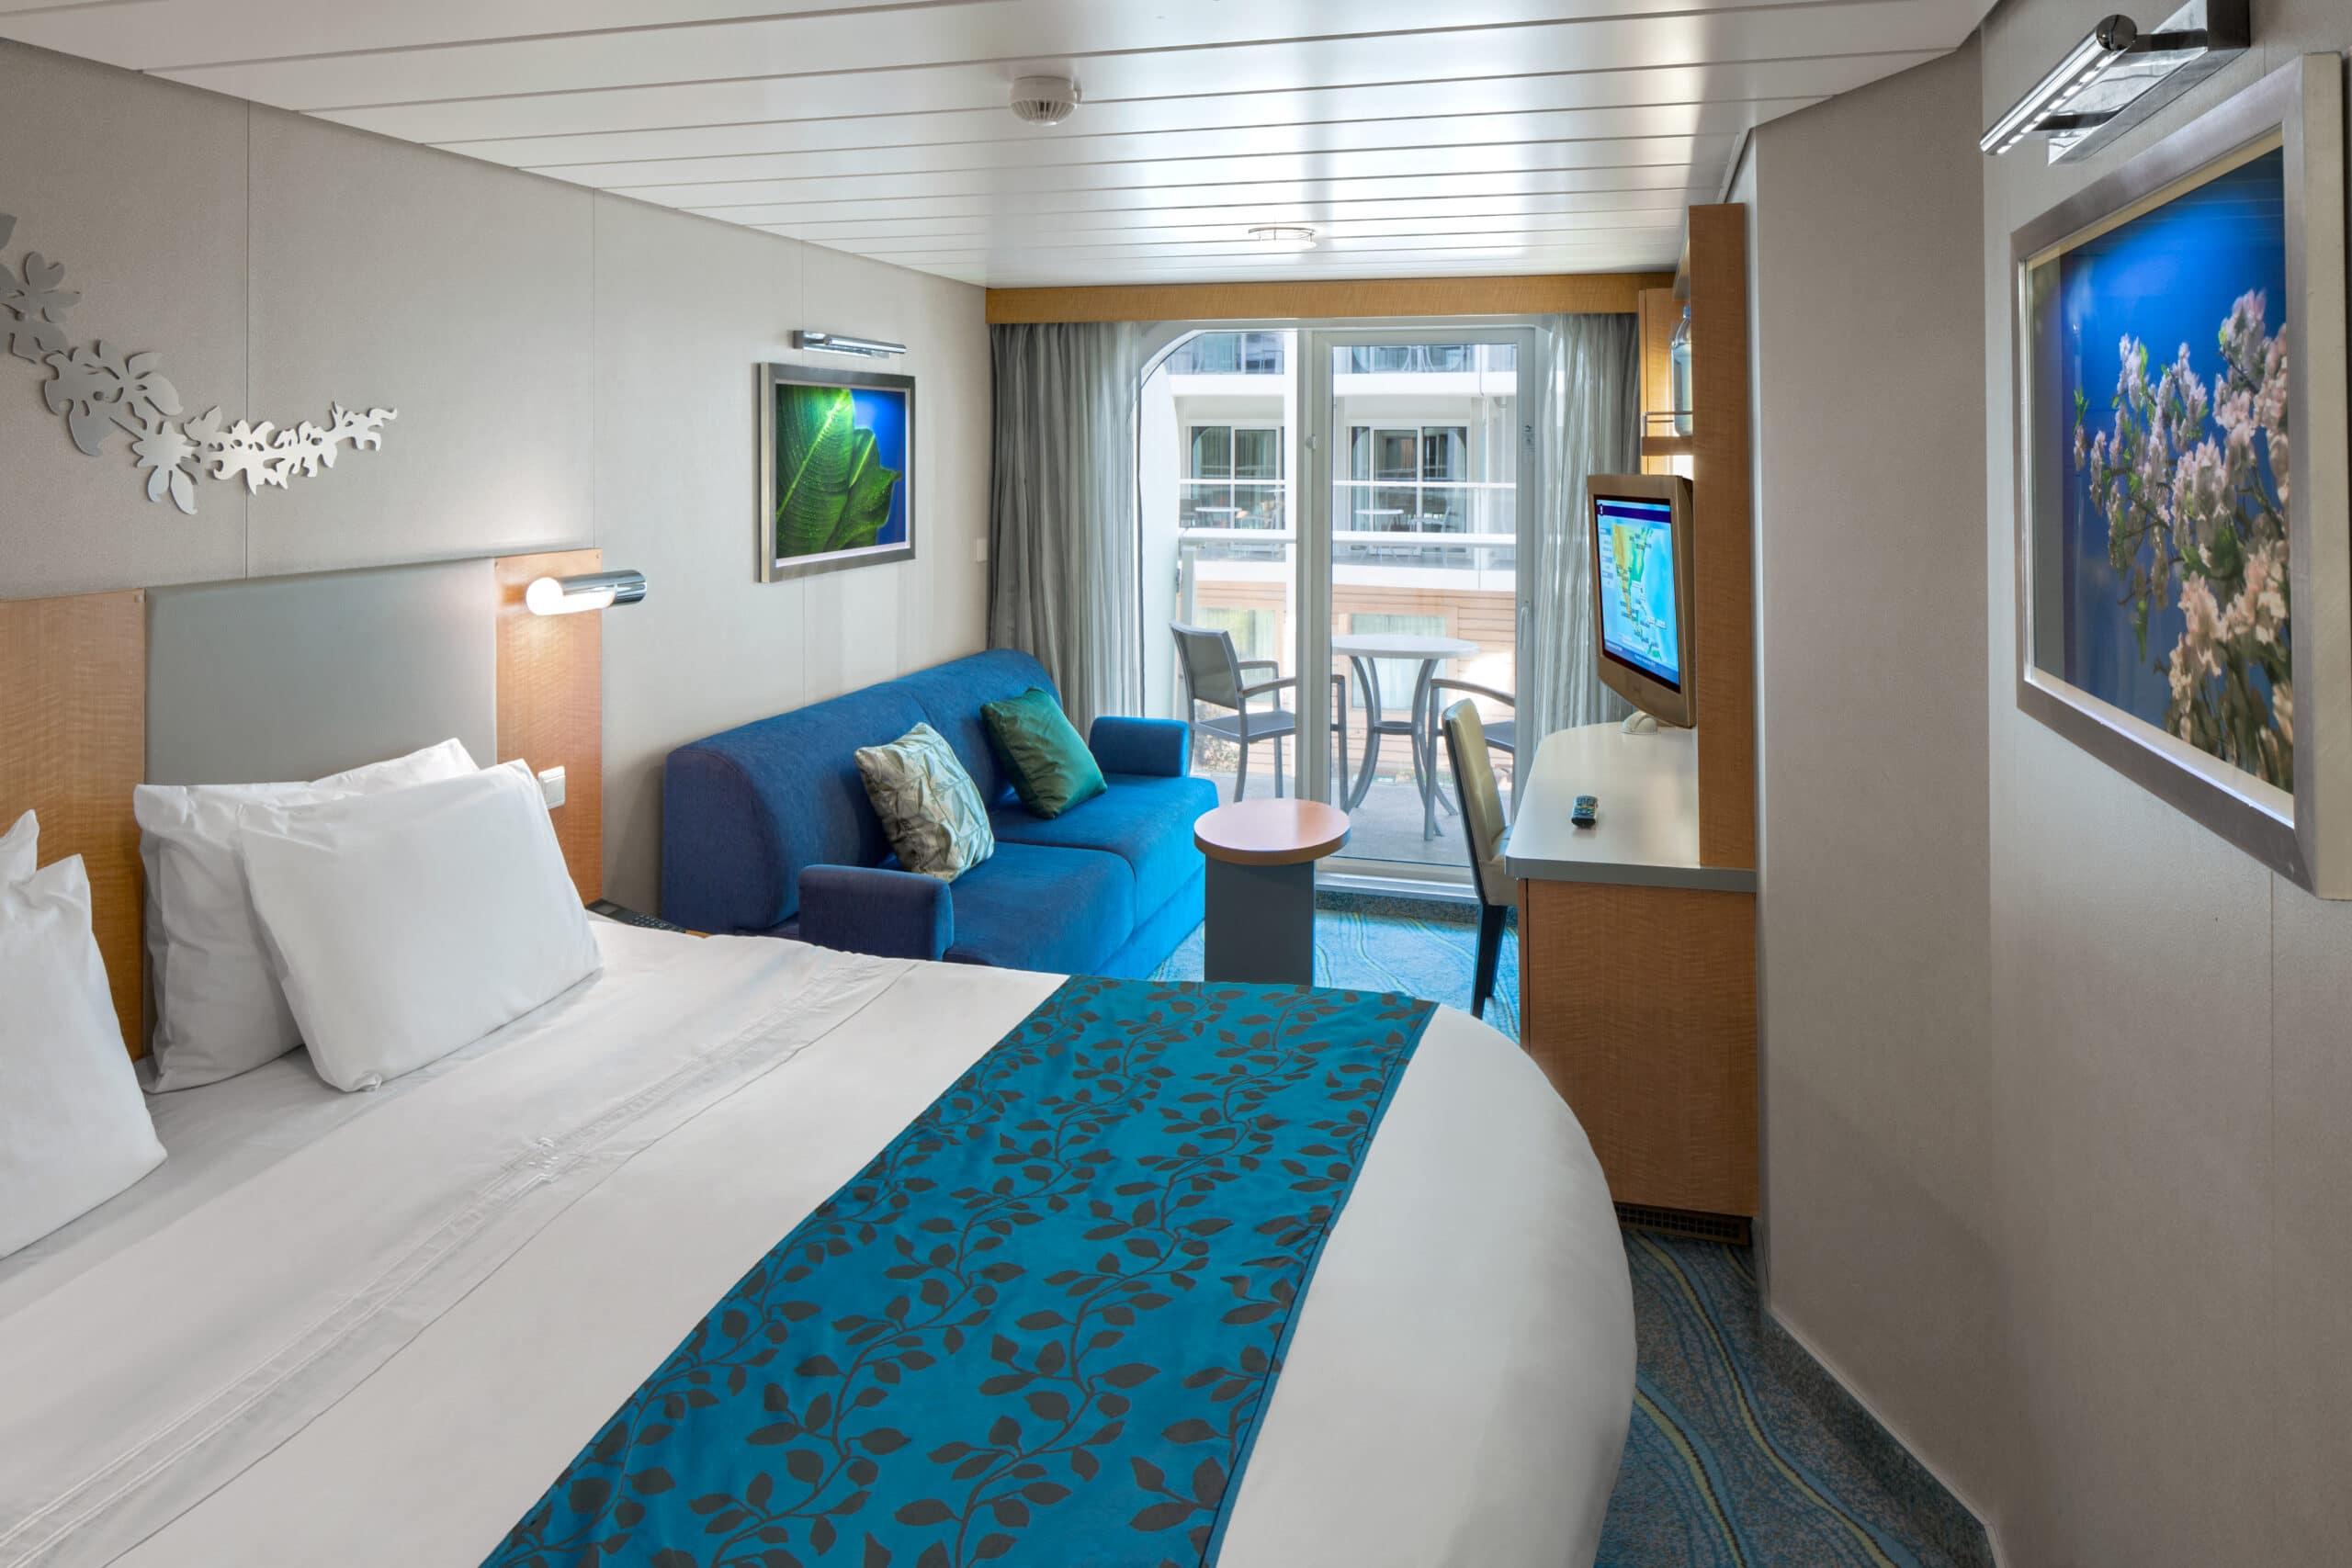 Royal-Caribbean-International-Allure-of-the-Seas-Oasis-of-the-seas-schip-cruiseschip-categorie-1J-2J-balkonhut-central-park